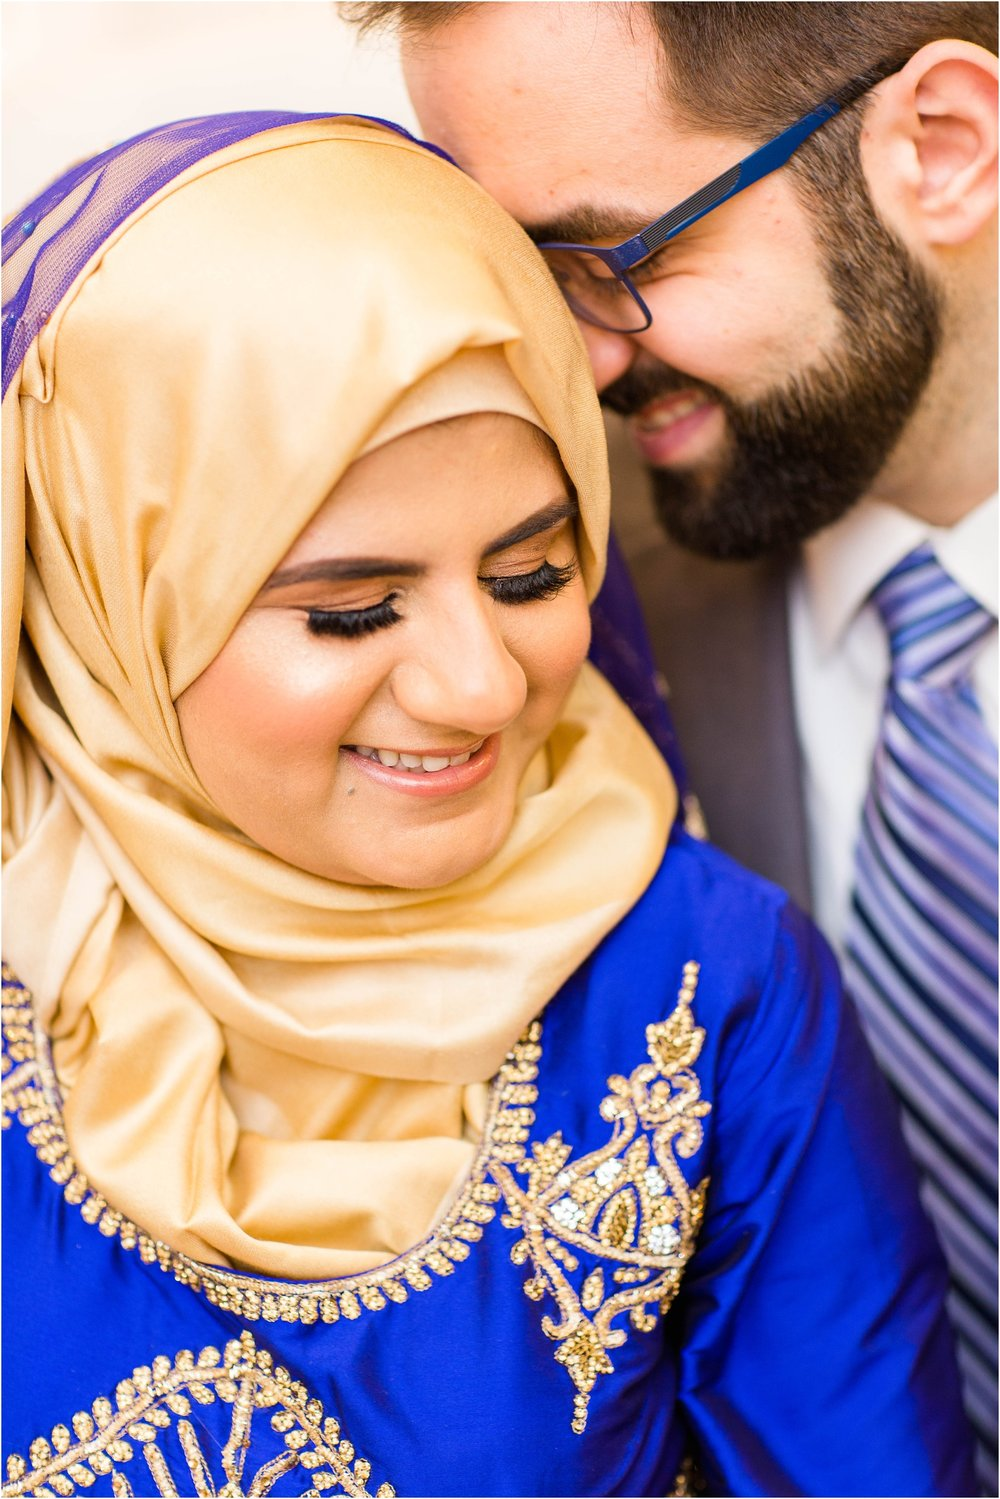 Estate-Banquet-Hall-Wedding-Toronto-Mississauga-Brampton-Scarborough-GTA-Pakistani-Indian-Wedding-Engagement-Photographer-Photography_0024.jpg